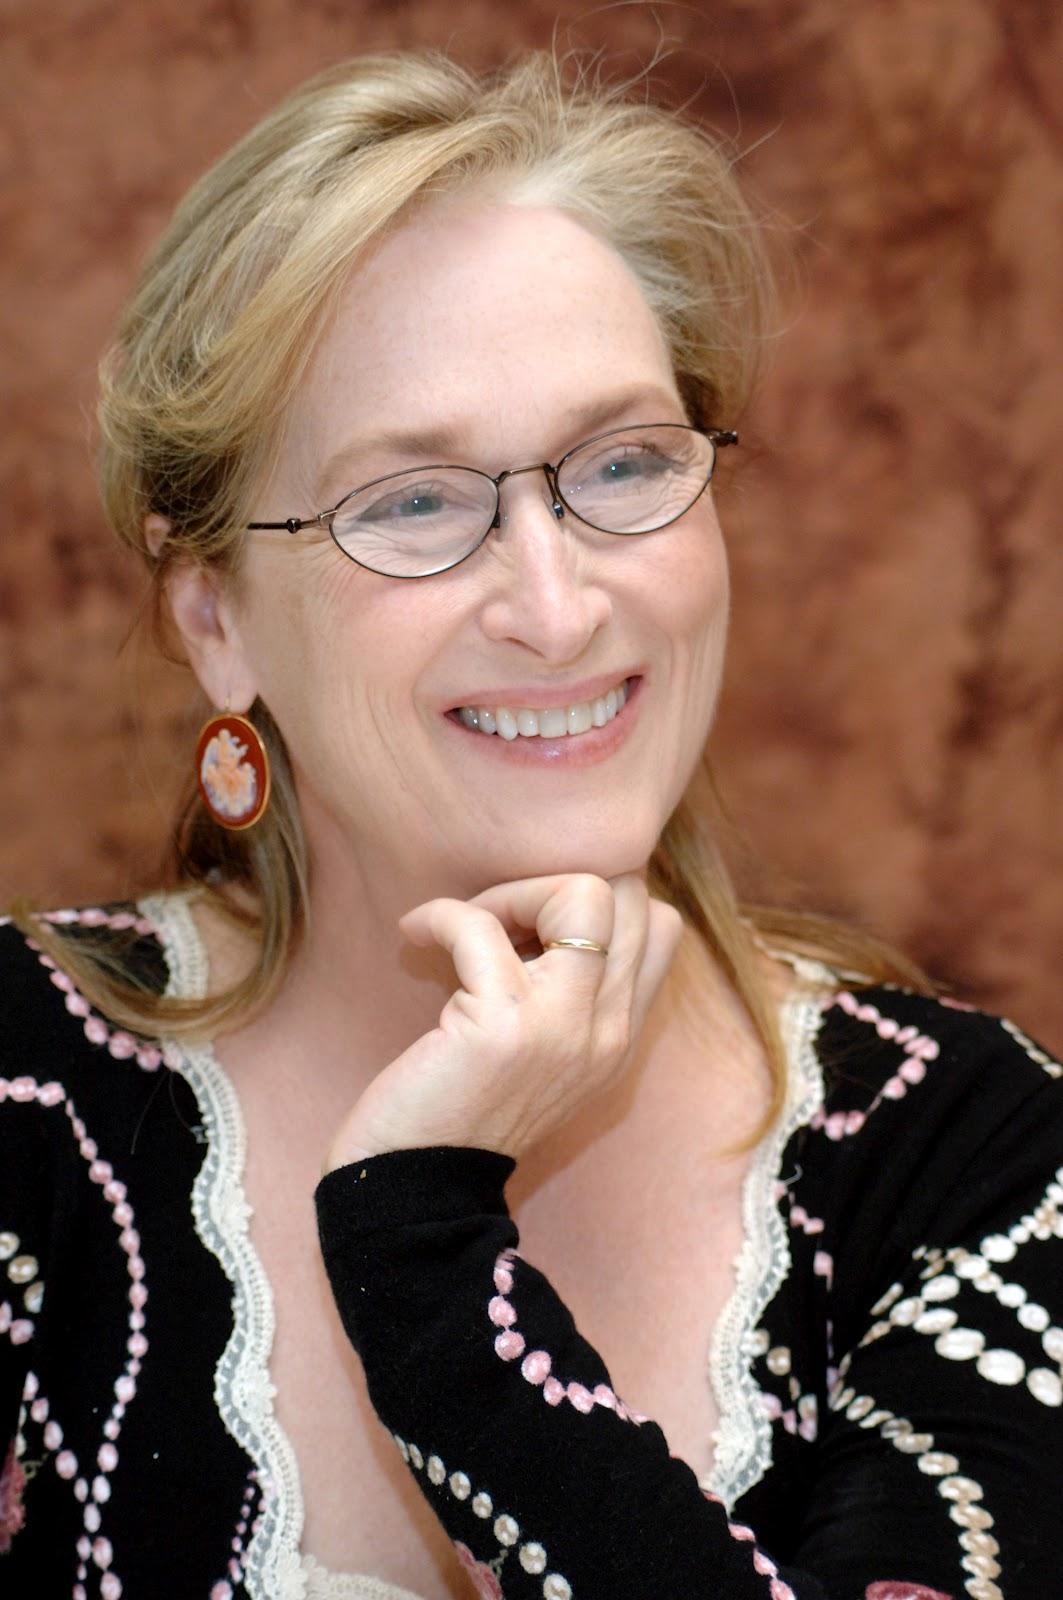 http://3.bp.blogspot.com/-QmDmMYXg0r4/UFvcusJW_KI/AAAAAAAAHQY/AuxSOYtRgEY/s1600/Meryl+Streep.jpg